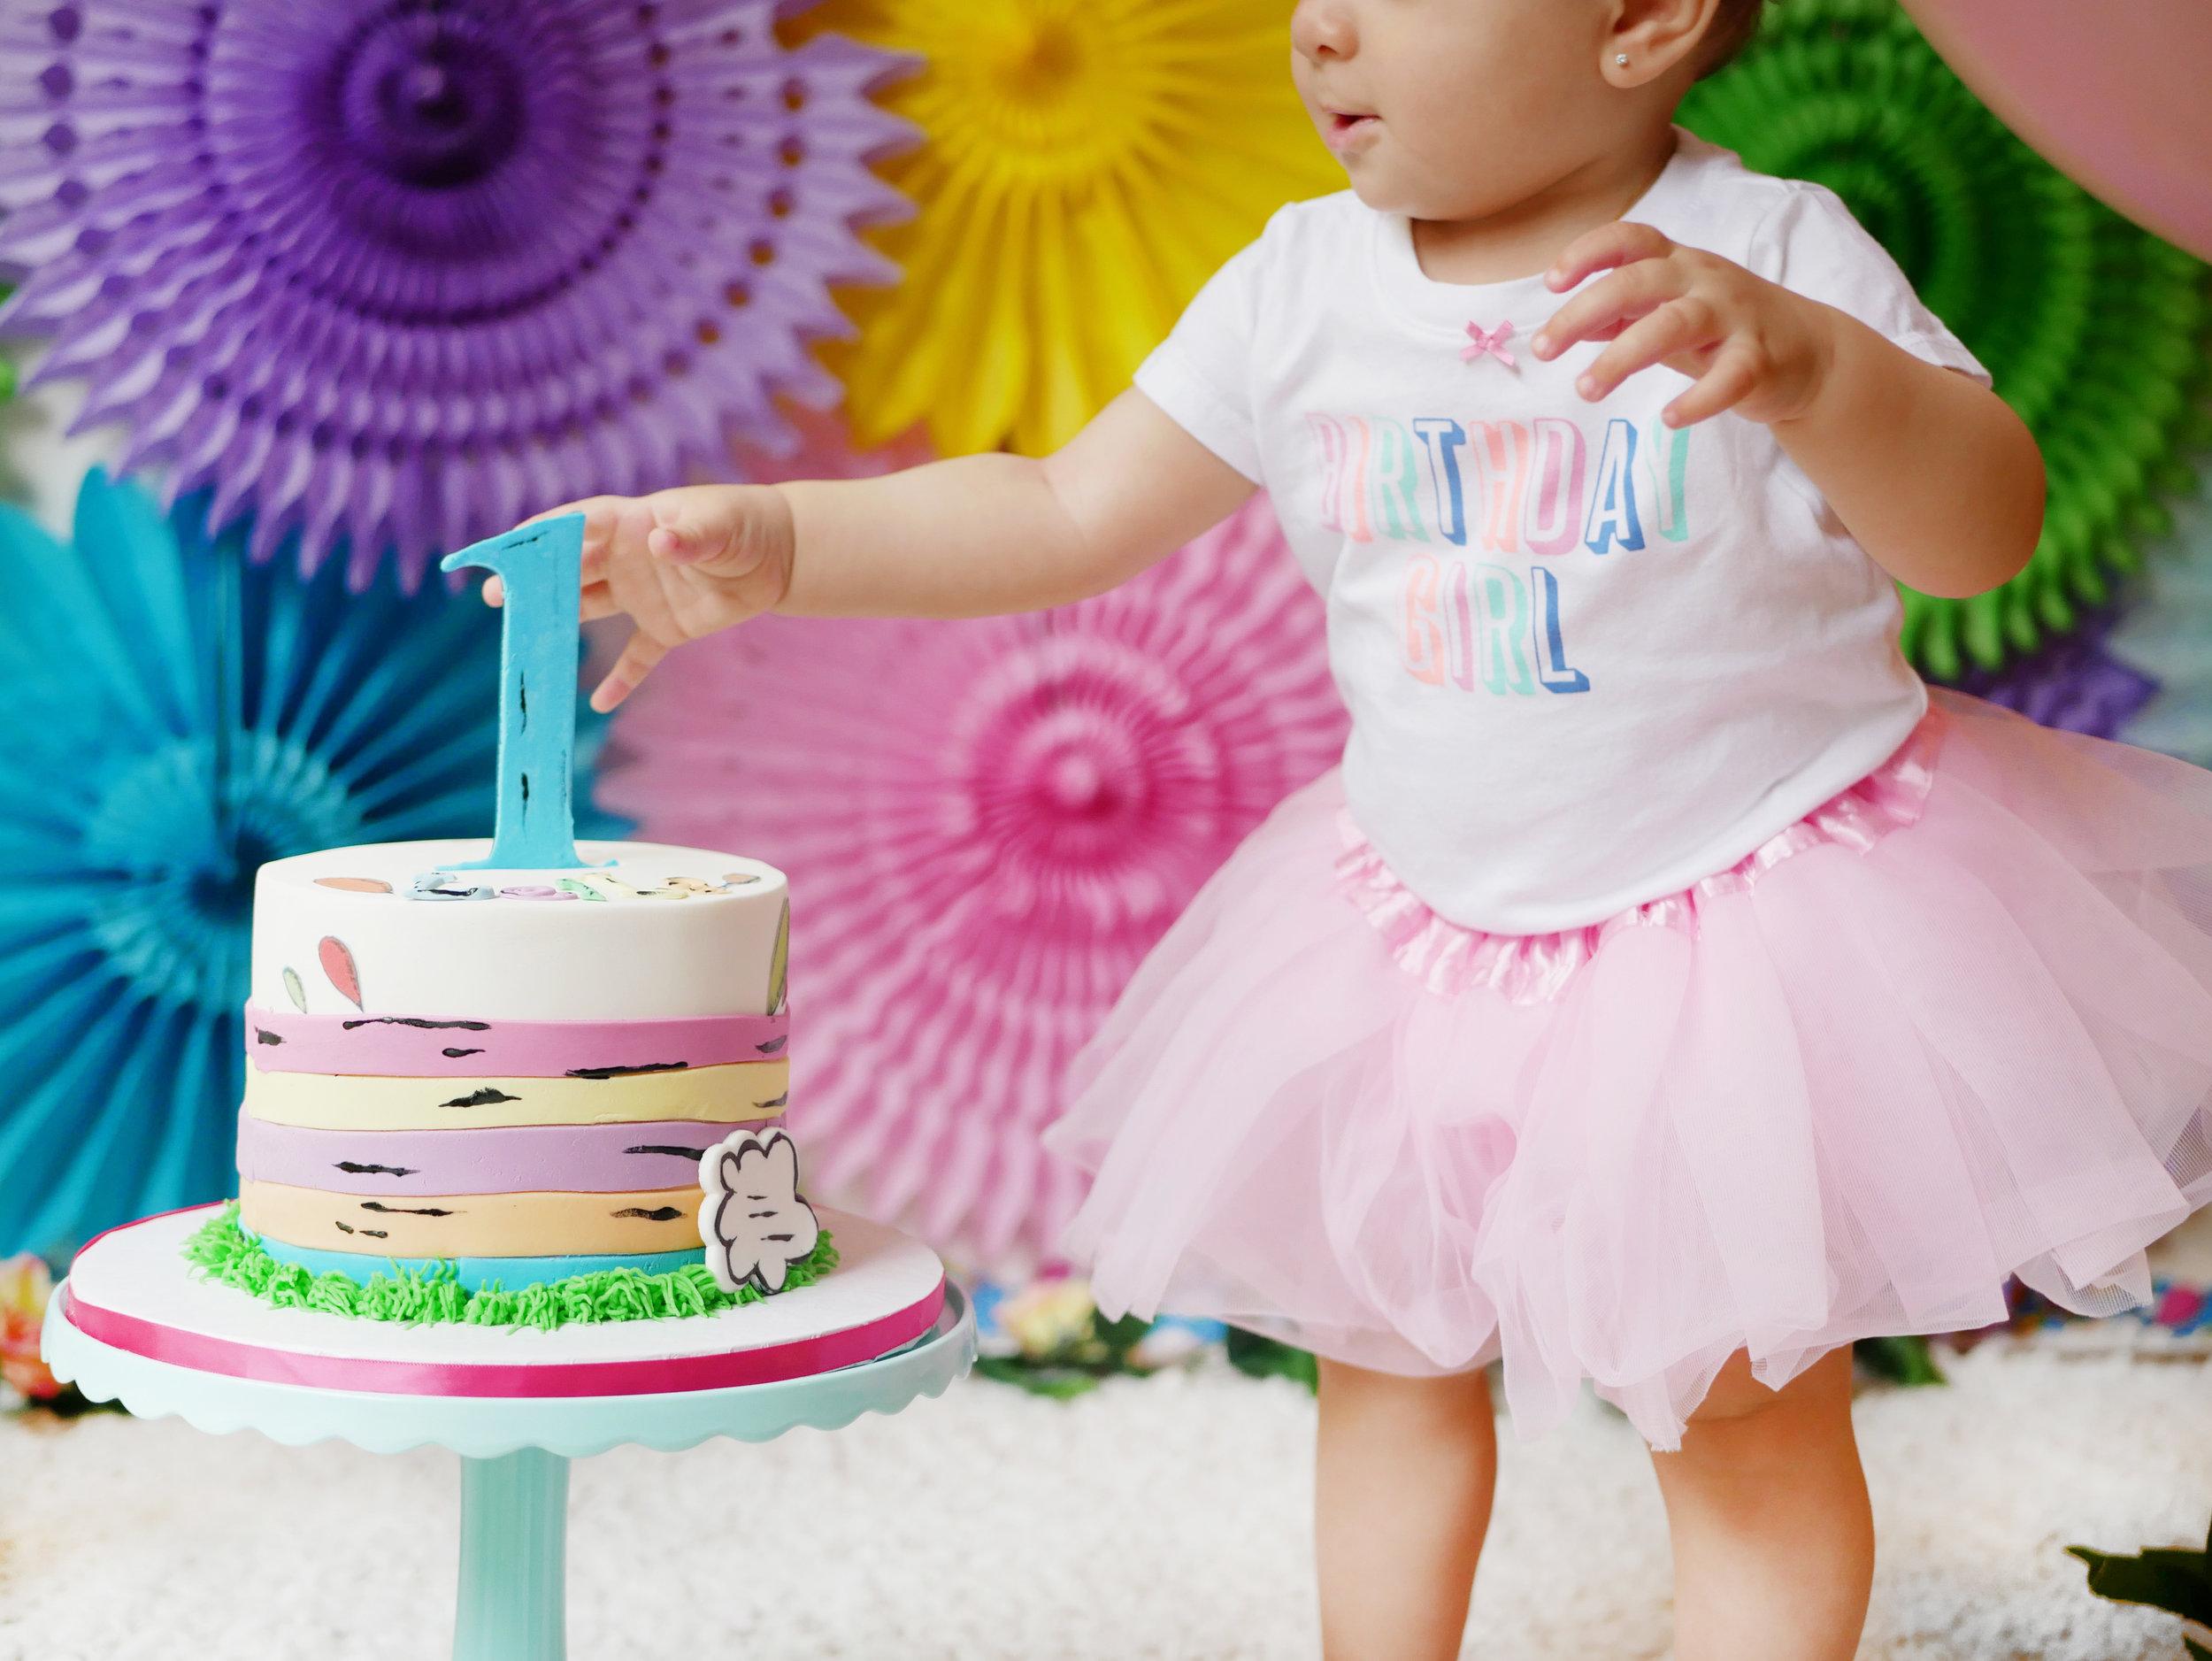 BONITO DESIGN EVENTS - LEILA CAKE SMASH 17.jpg